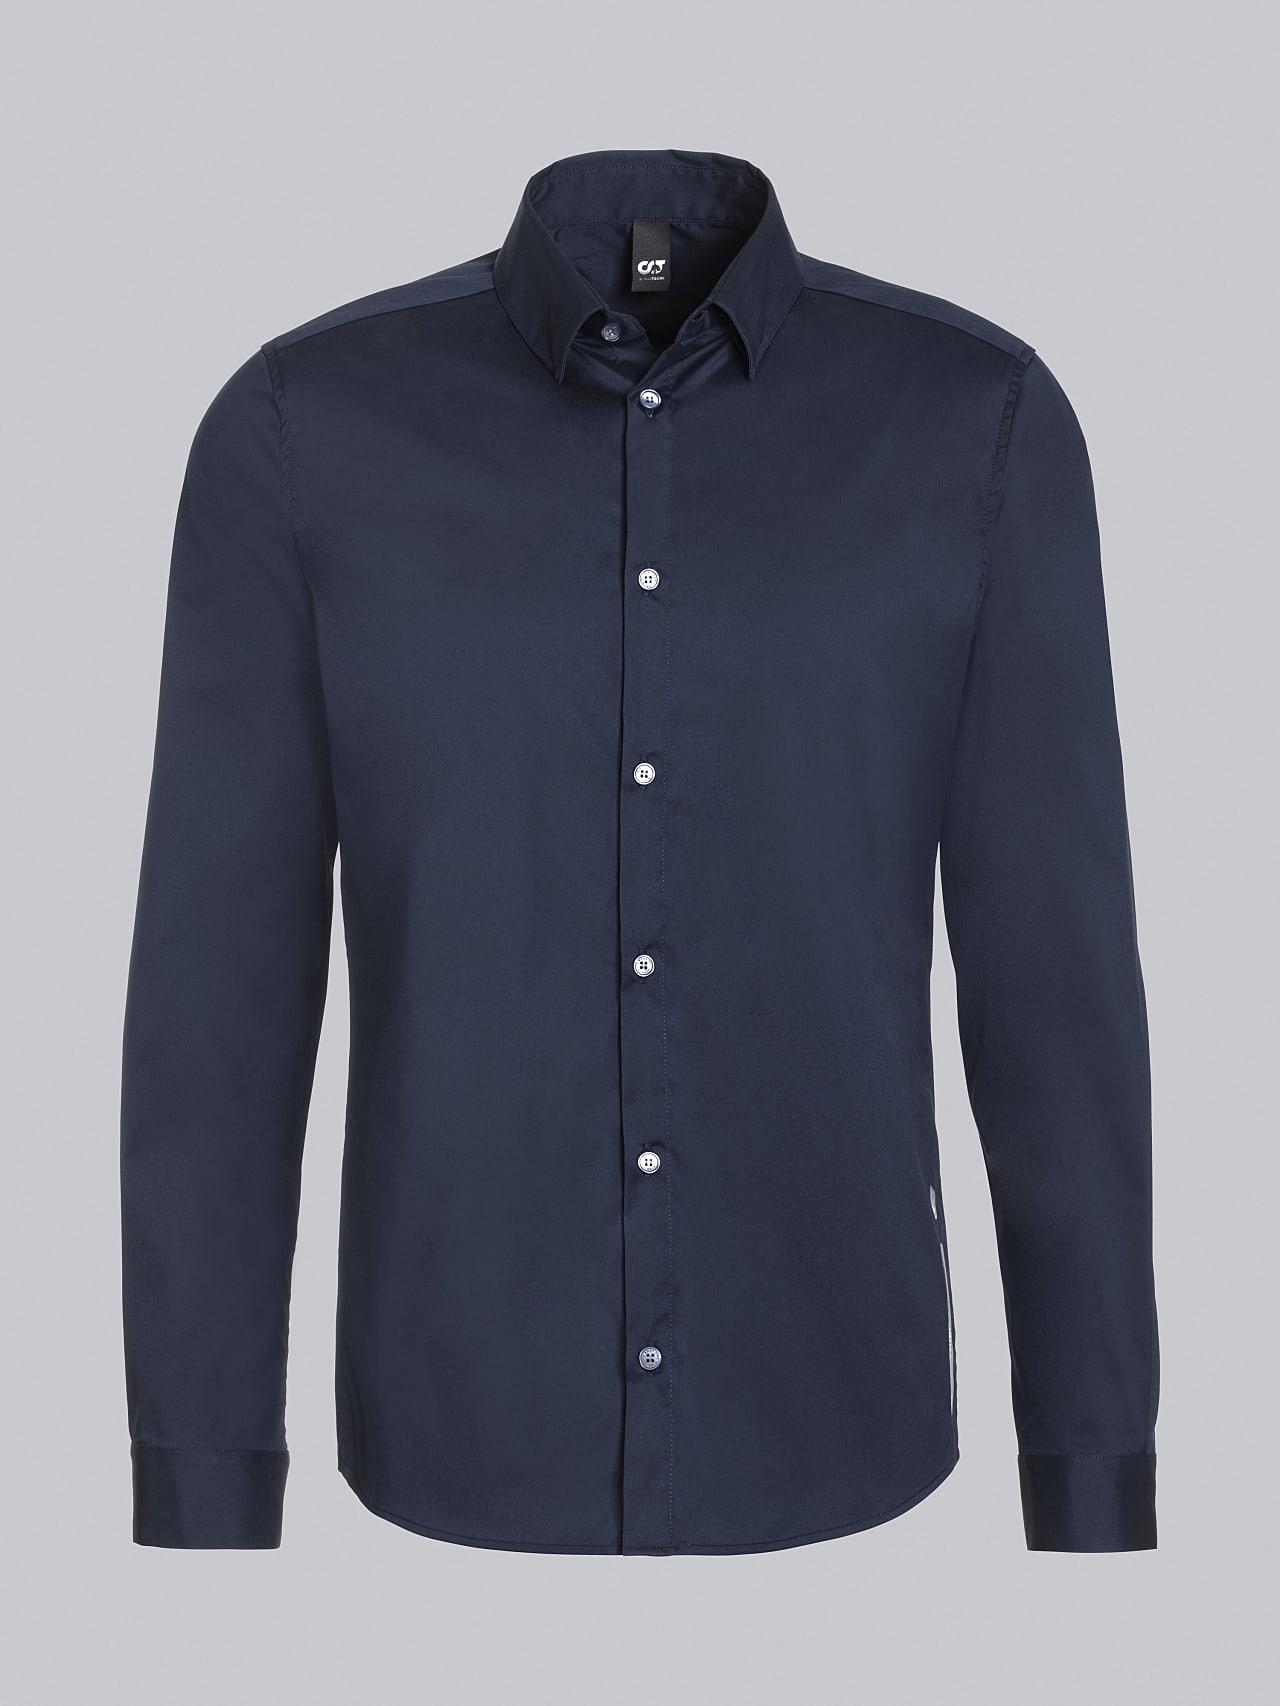 WAARG V2.Y5.02 Easy-Care Cotton Shirt navy Back Alpha Tauri